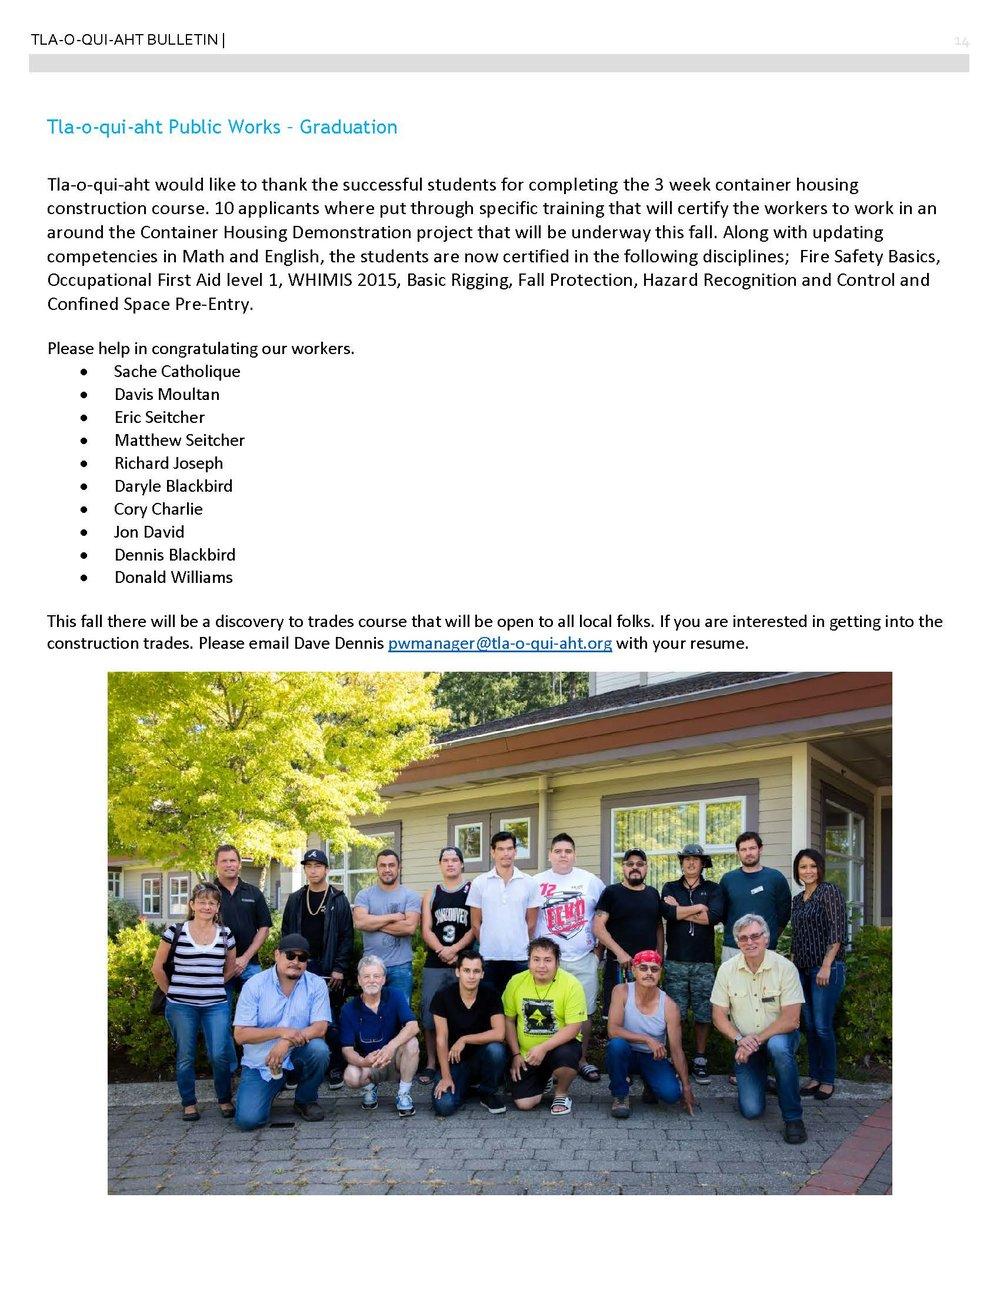 TFN Bulletin Sept 1-2016_Page_14.jpg